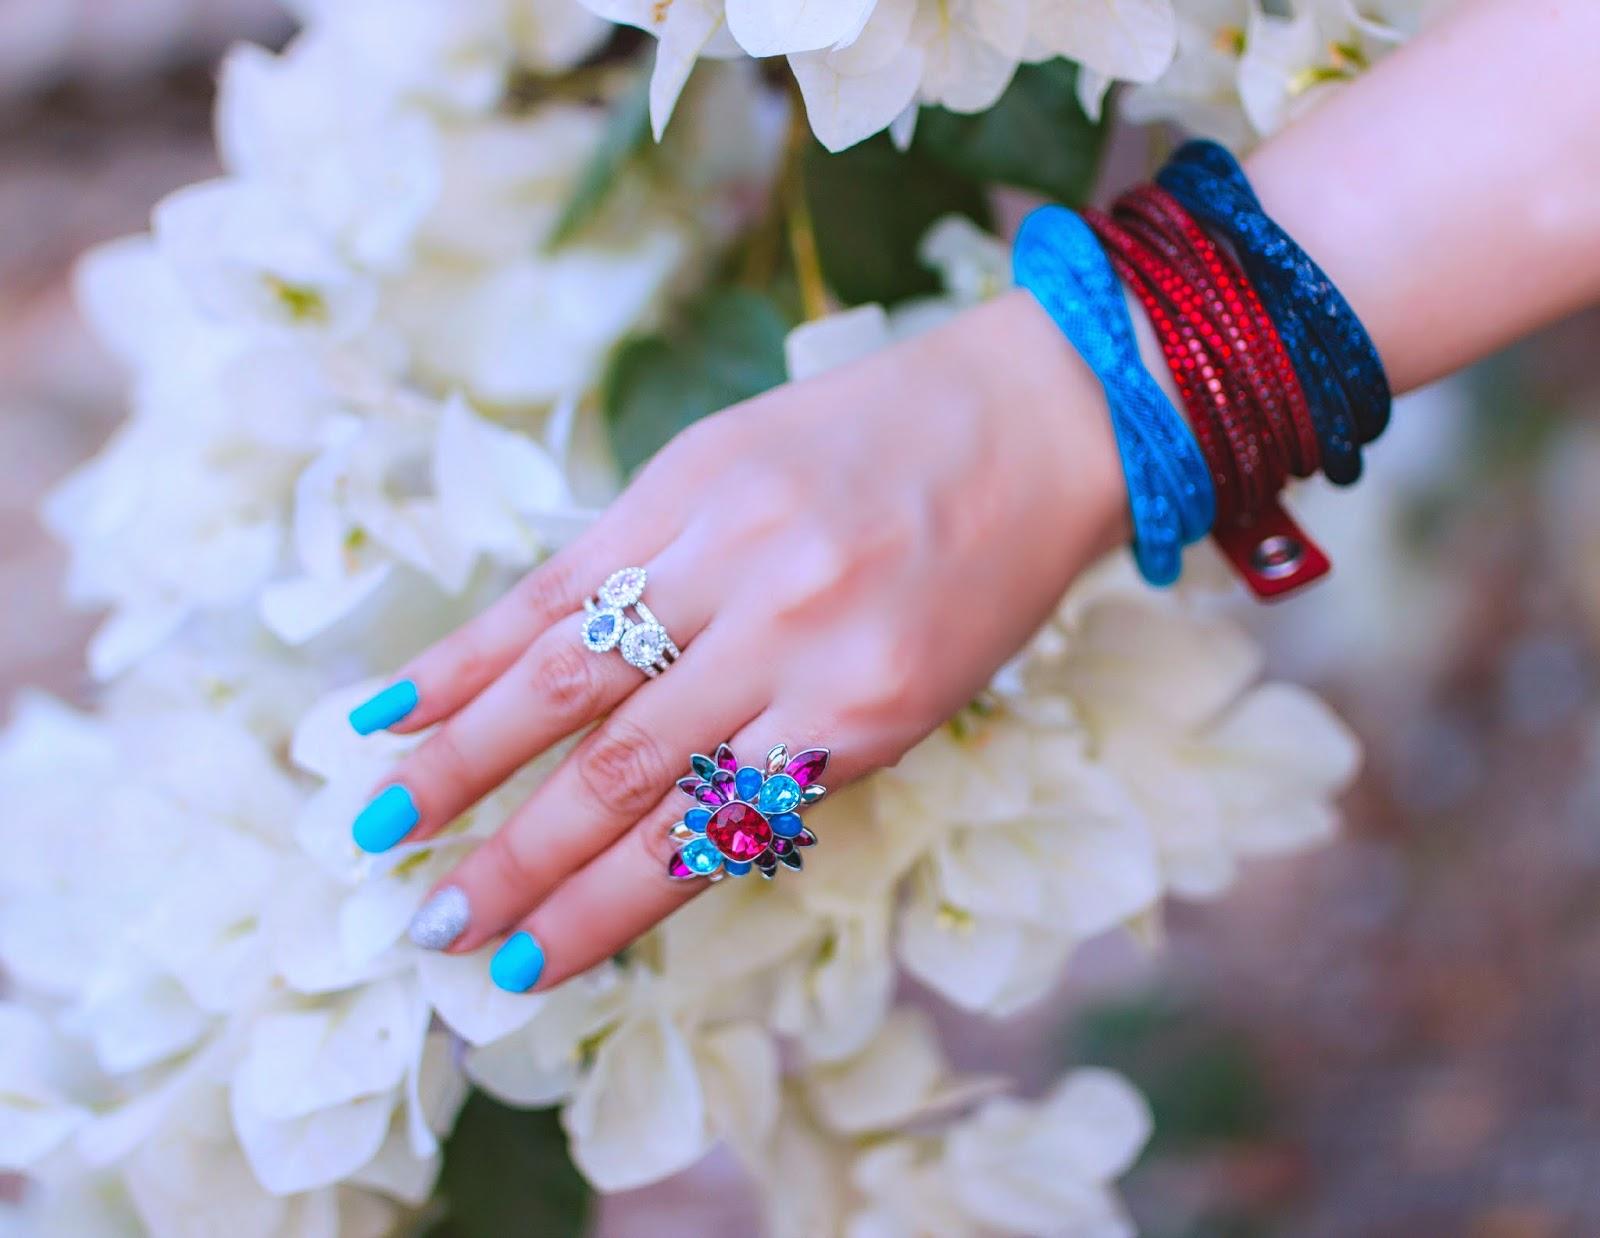 Swarovski Stardust Bracelets, Slake Bracelet, Cardinal Floral Ring, Pastel Christie Ring Set